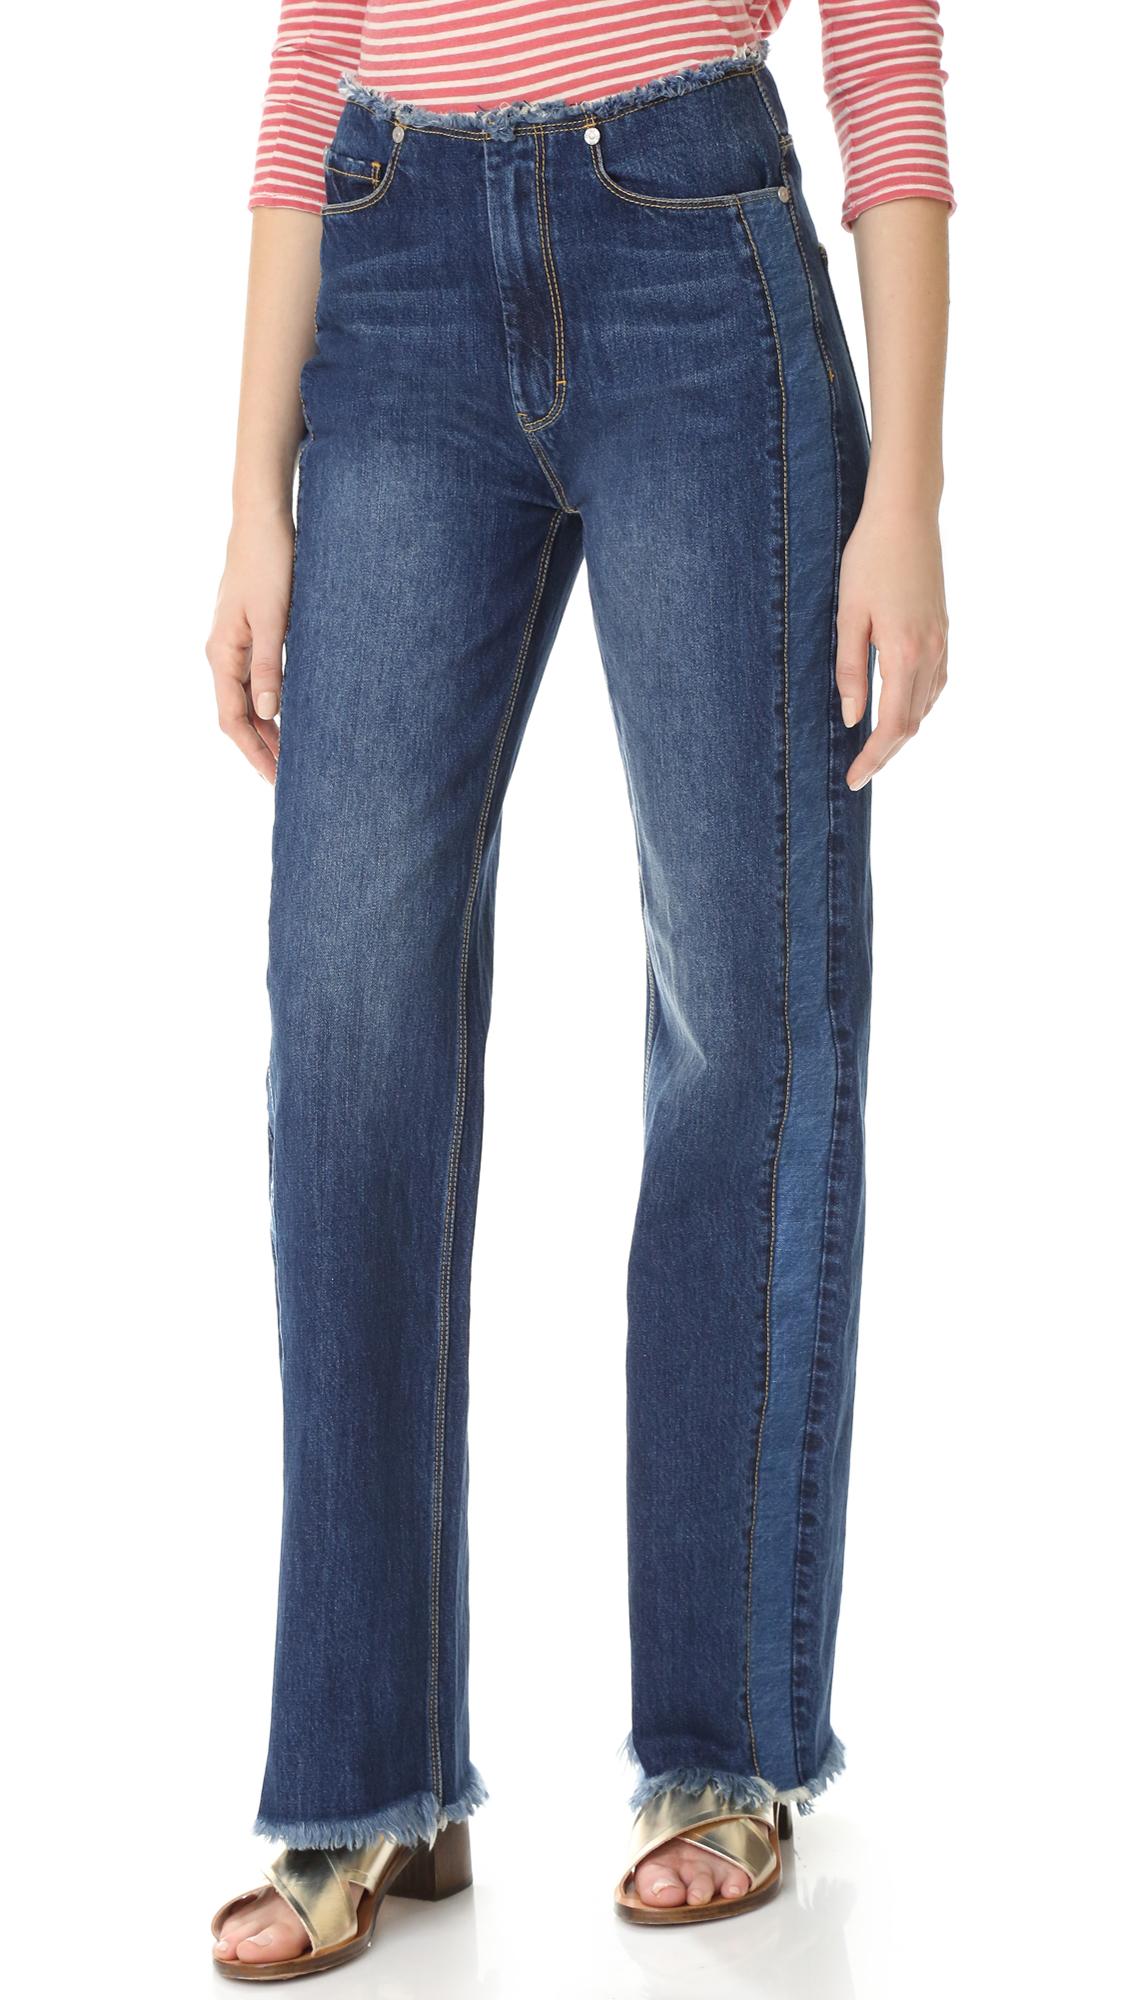 La Vie Rebecca Taylor Raw Edge Denim Jeans - Indigo Combo at Shopbop